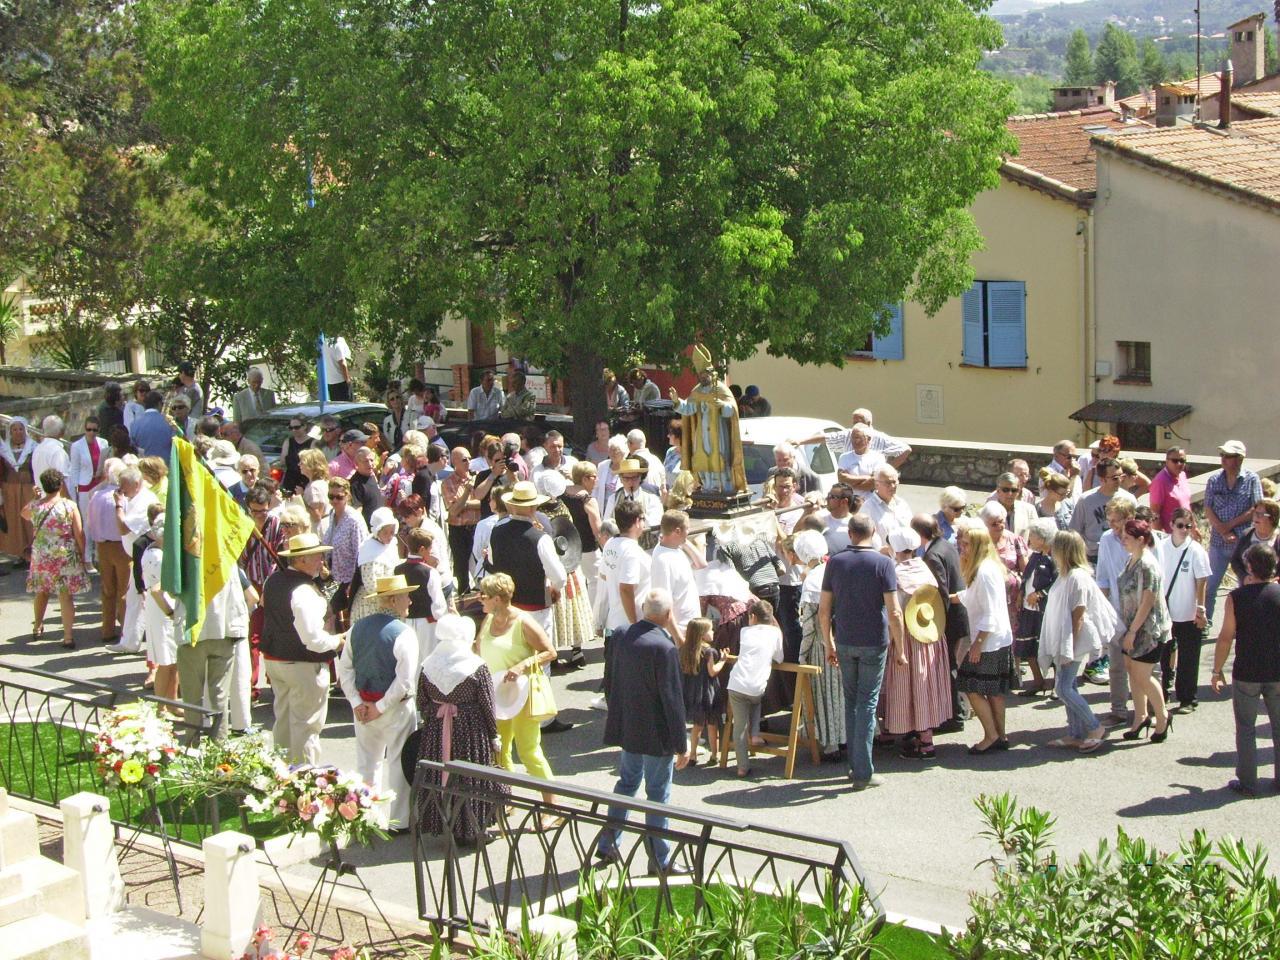 St Pons 1